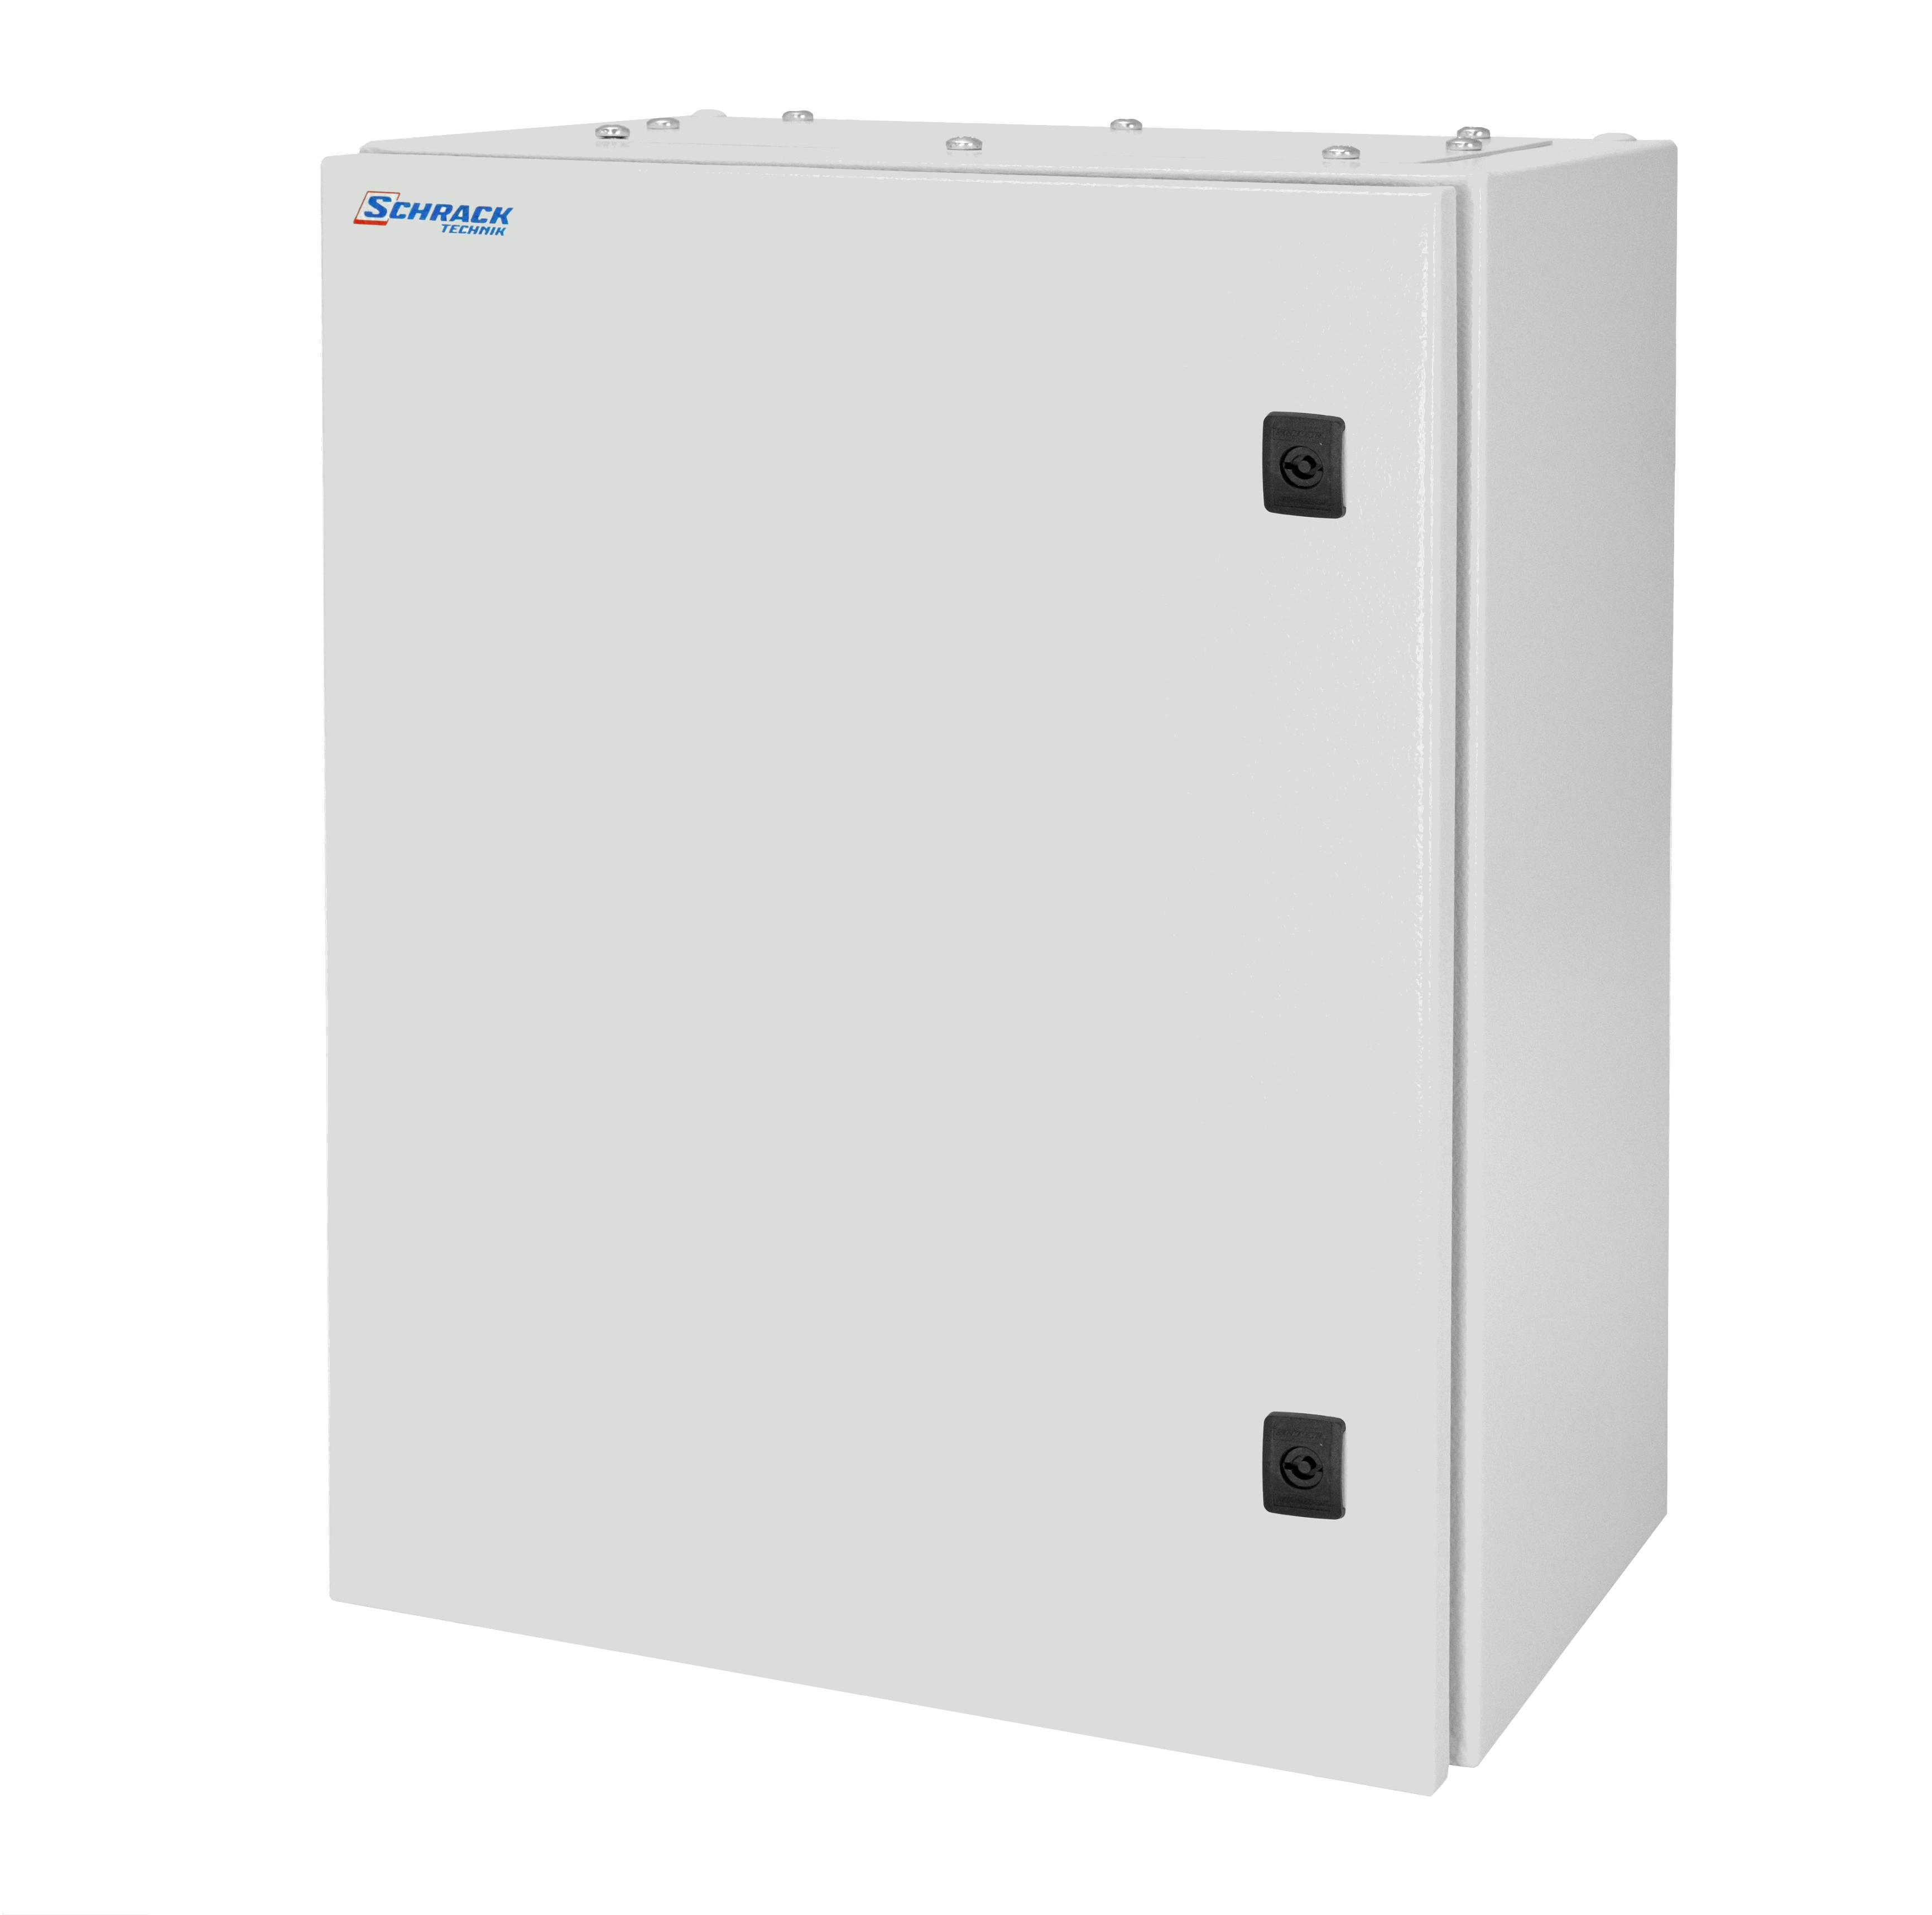 1 Stk Wandschrank Mono IP66 H=800 B=600 T=300 Stahlblech WSM8060300